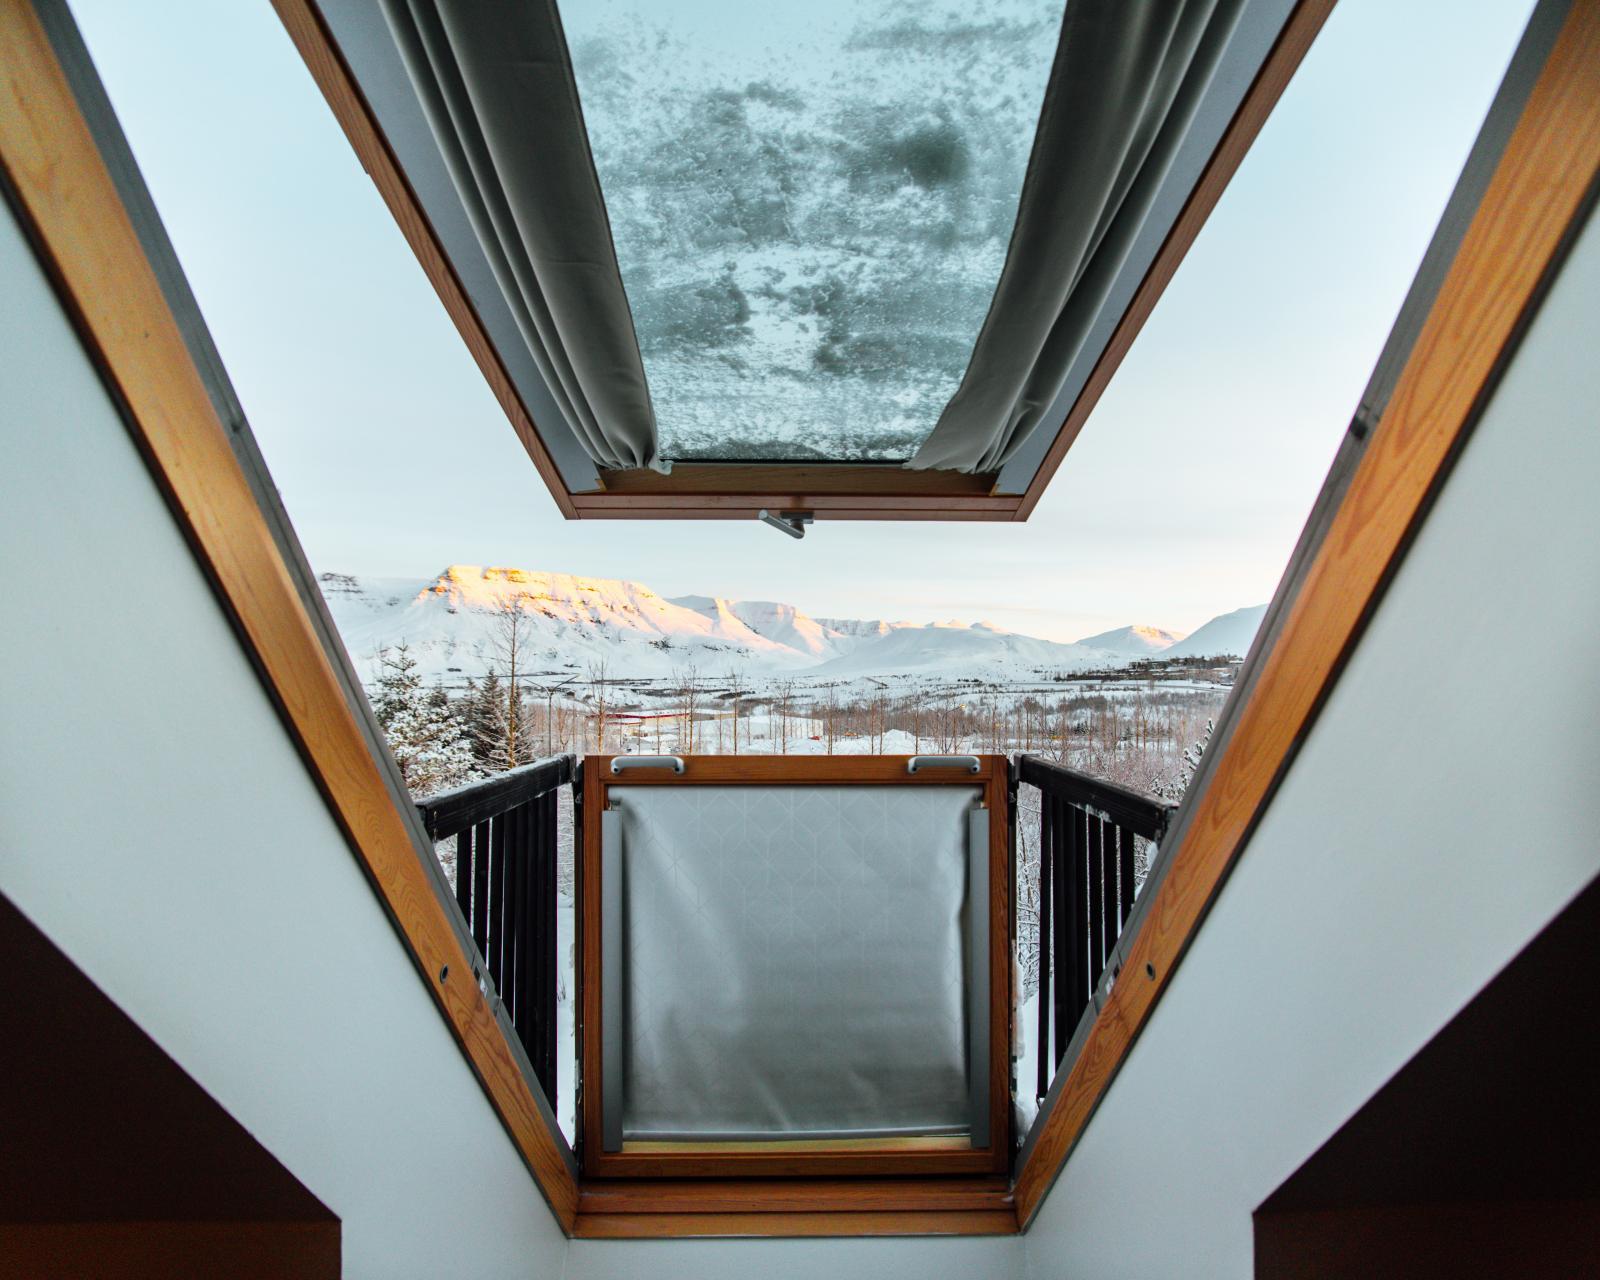 Luxury Hotel Rooms & Suites | Iceland Hotel Reykjavik | Hotel Laxnes